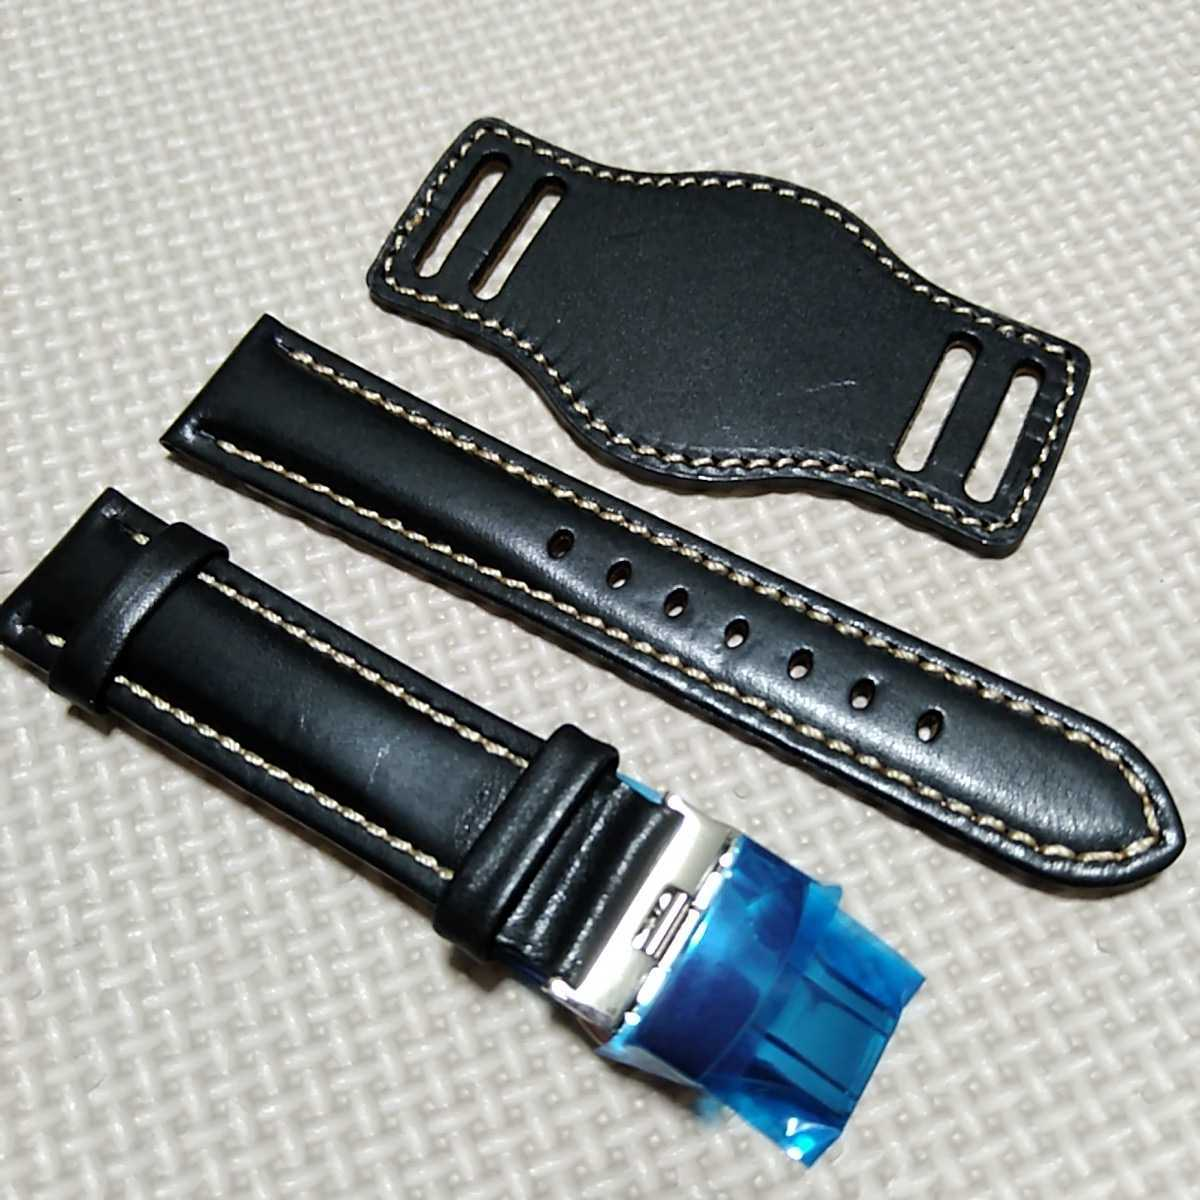 No75 ブンド BUND 本革レザーベルト 腕時計ベルト 交換用ストラップ ブラック 20mm 未使用 Dバックル 高品質 ドイツパイロット 空軍_画像1